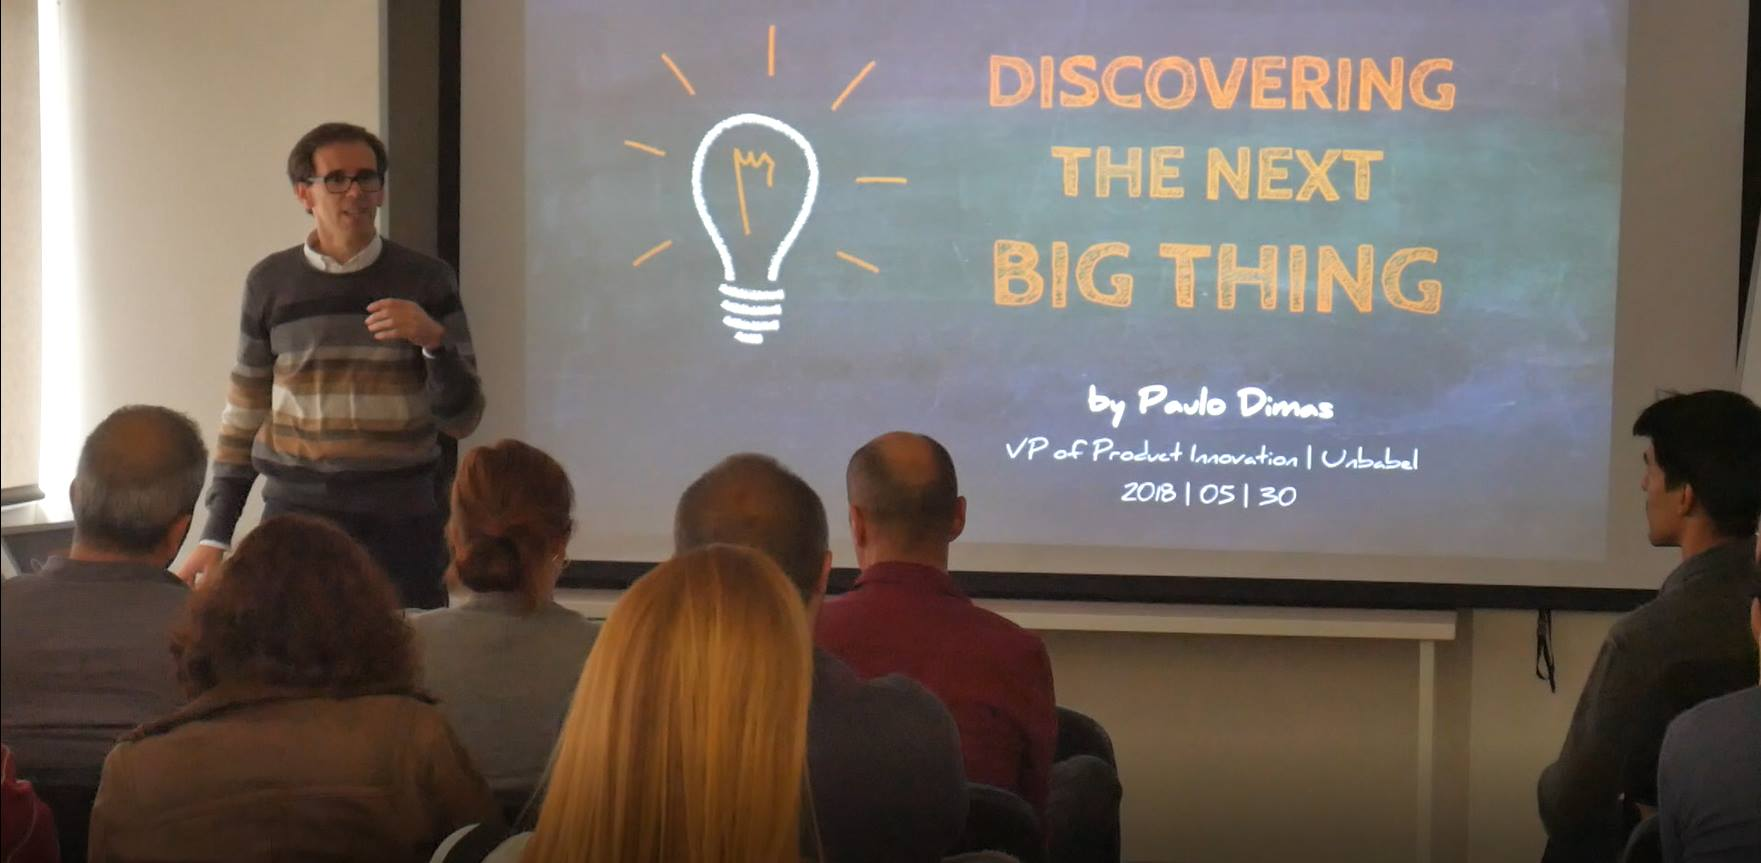 Unbabel head of product innovation Paulo Dimas, customer service technology